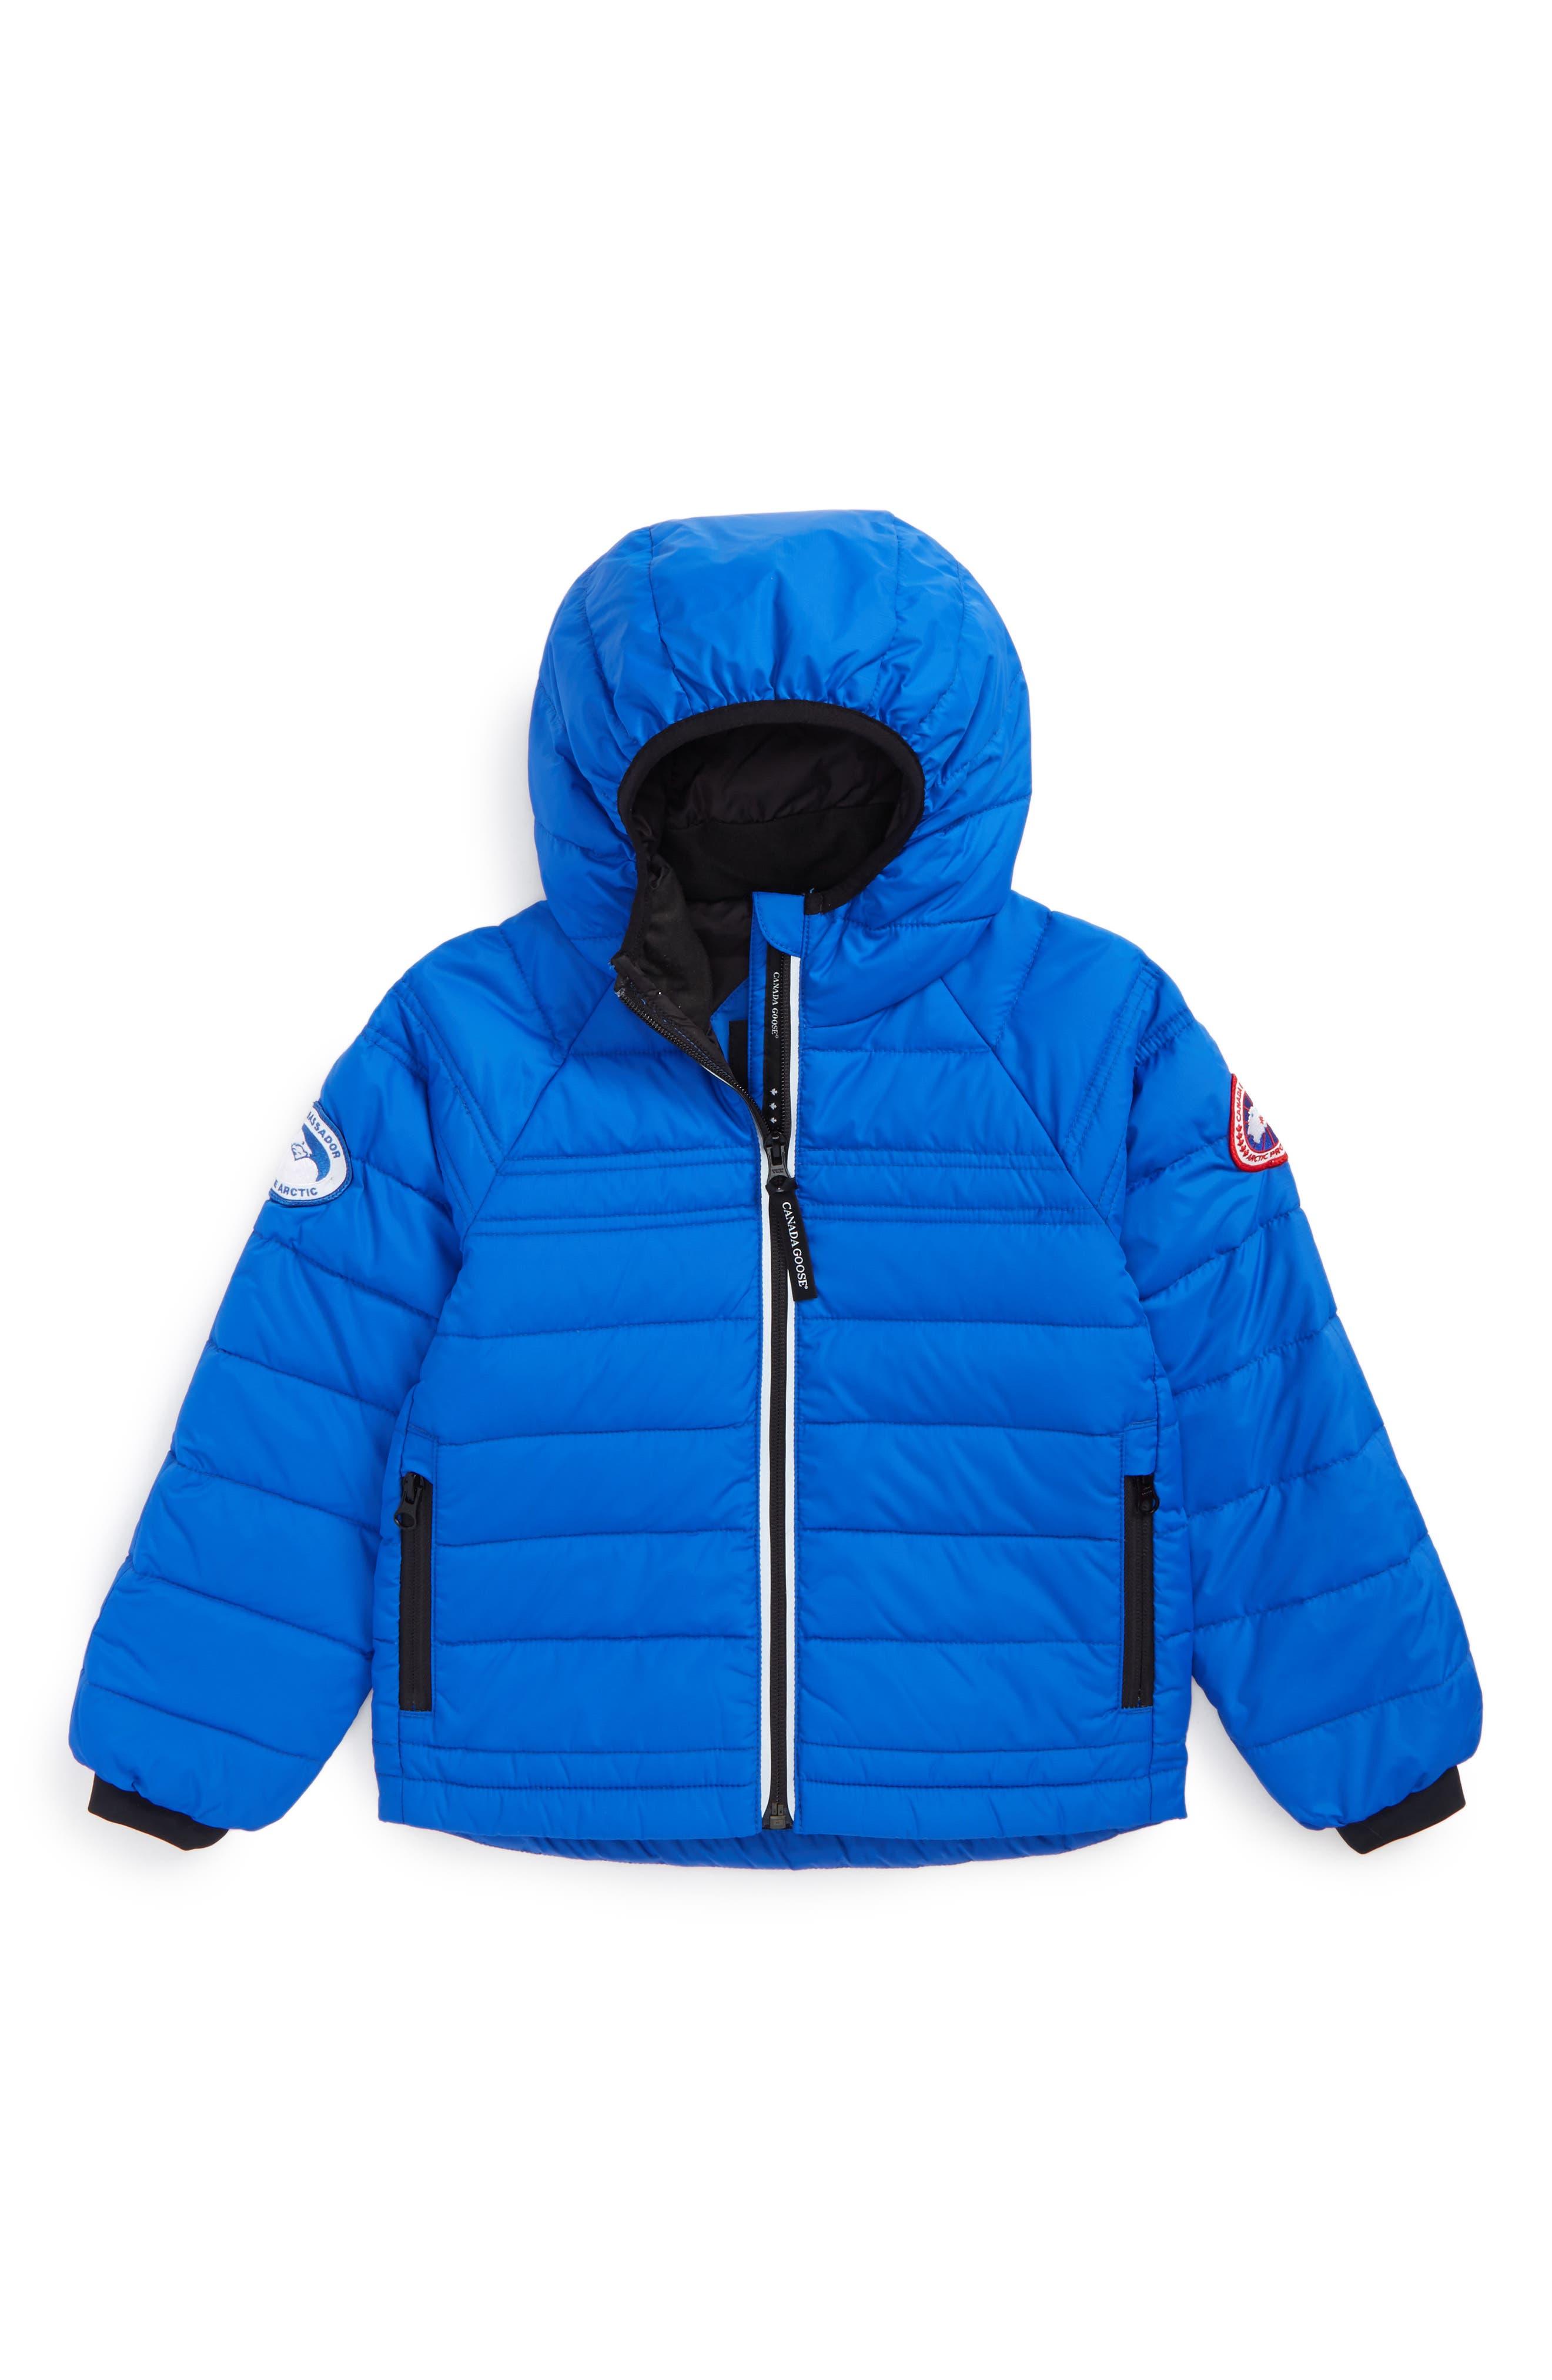 CANADA GOOSE Bobcat Water Resistant Hooded Down Jacket, Main, color, PBI BLUE